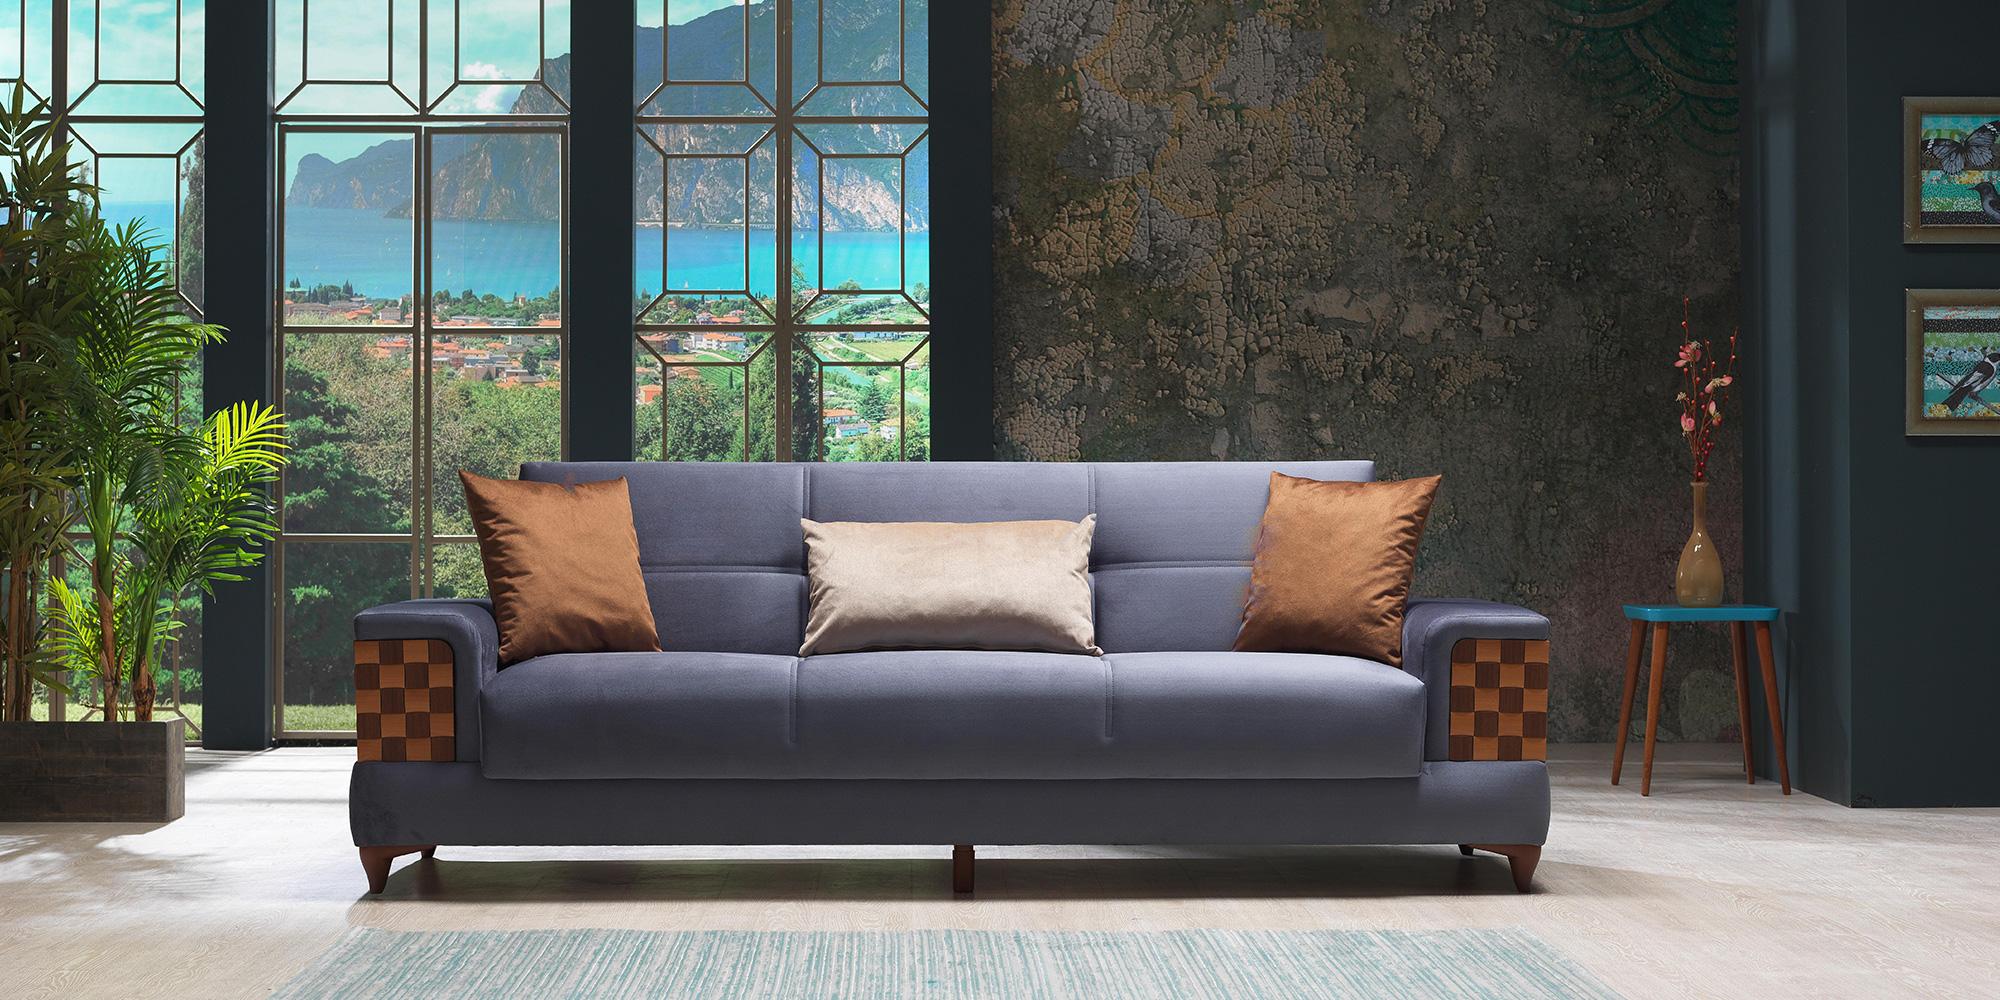 dolce 3 2 1 maxi sofa set yuvam m belhaus in wuppertal cilek offizieller h ndler in europa. Black Bedroom Furniture Sets. Home Design Ideas